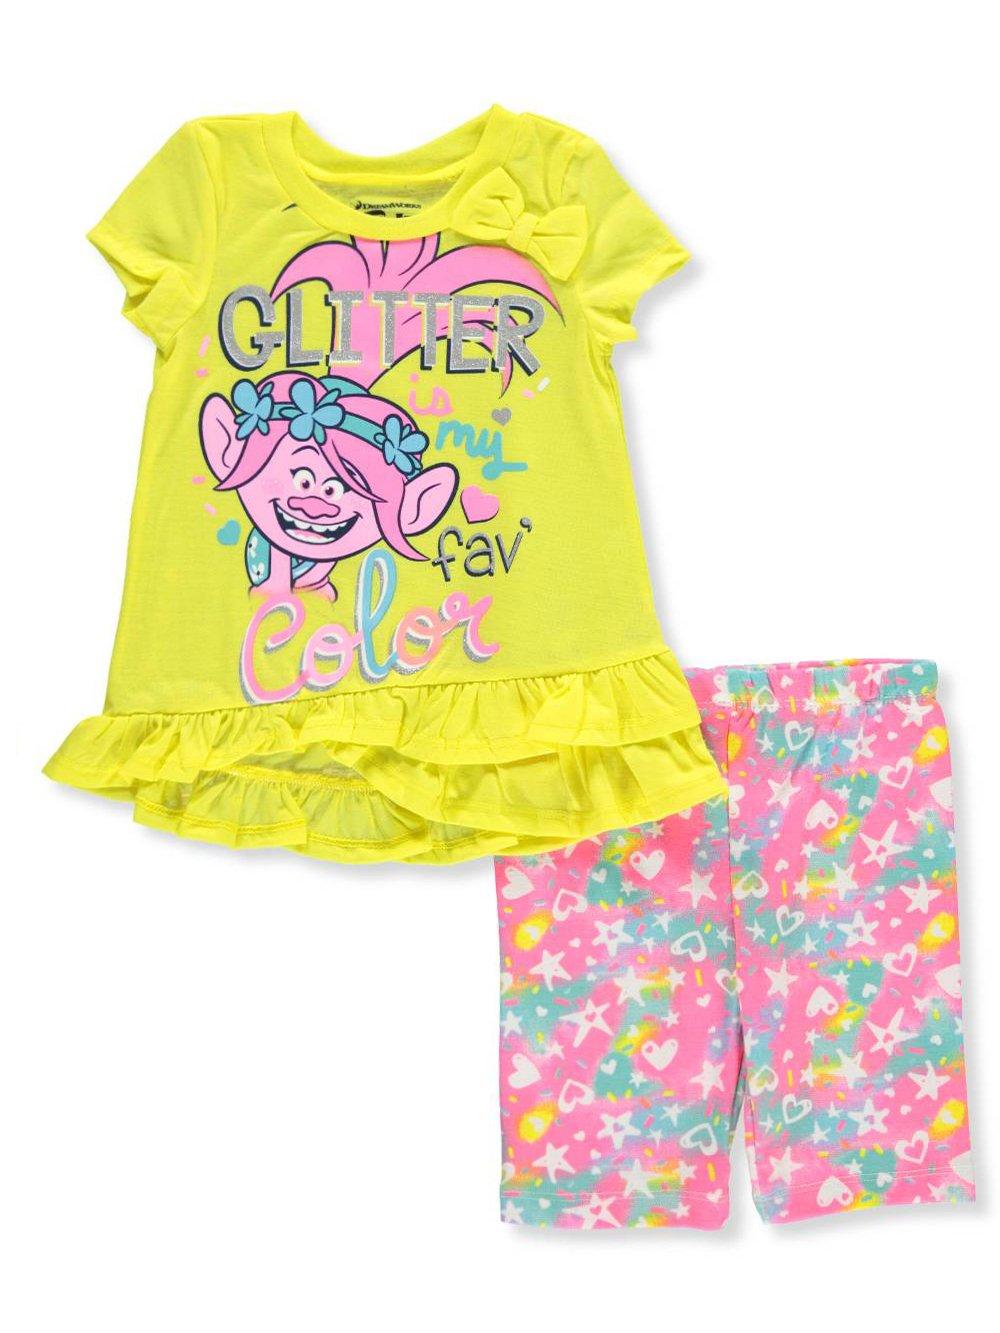 Trolls Girls' 2-Piece Outfit